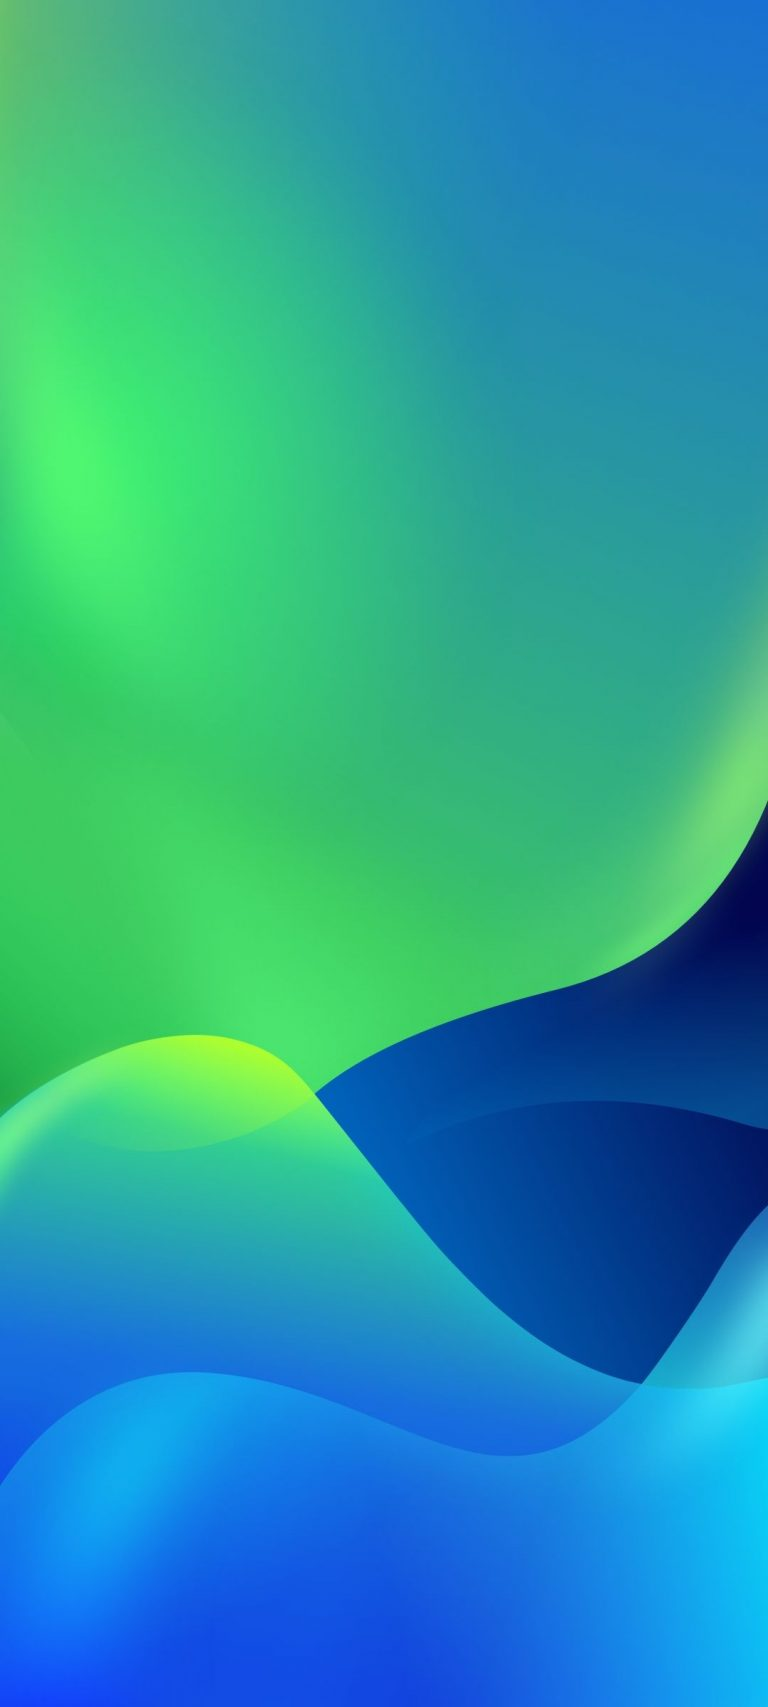 Realme UI 2.0 Stock Wallpaper [1080x2400] - 04